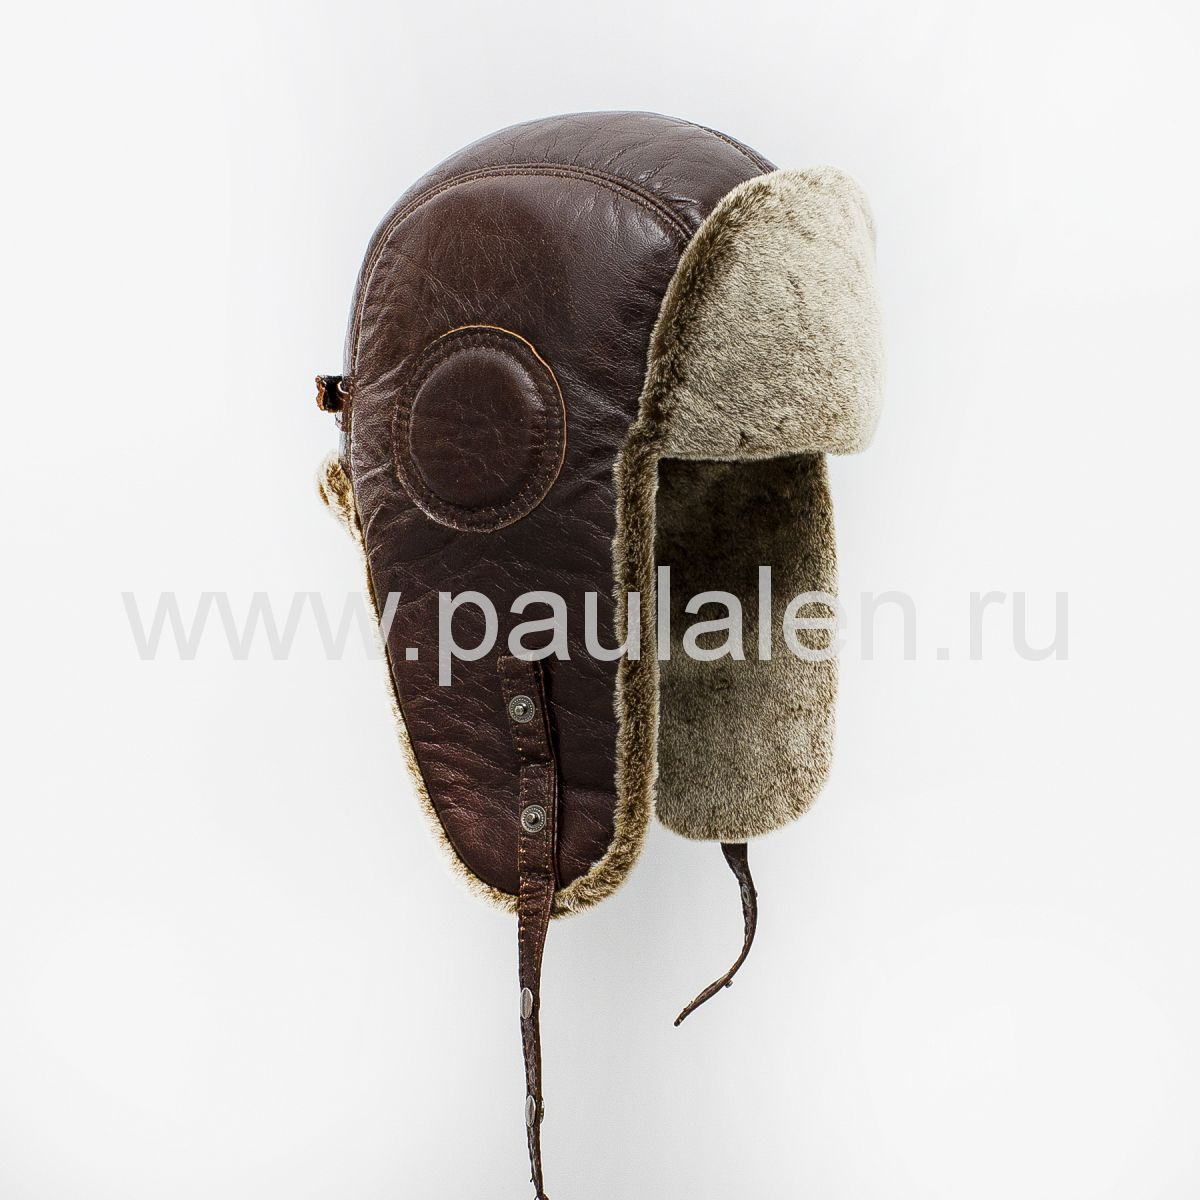 Мужской шлем Авиатор из кожи и овчины. Артикул B006